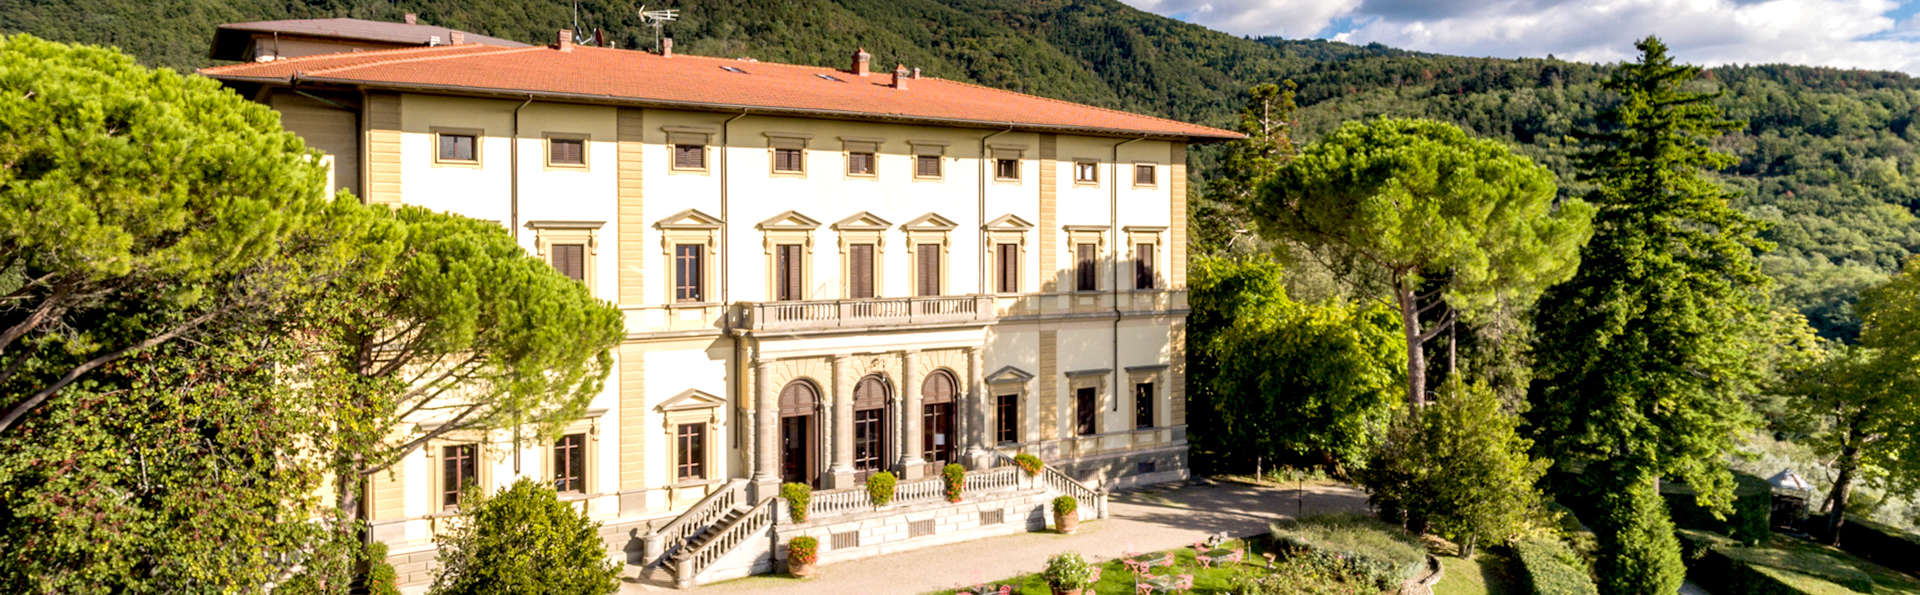 Villa Pitiana - Edit_Front2.jpg